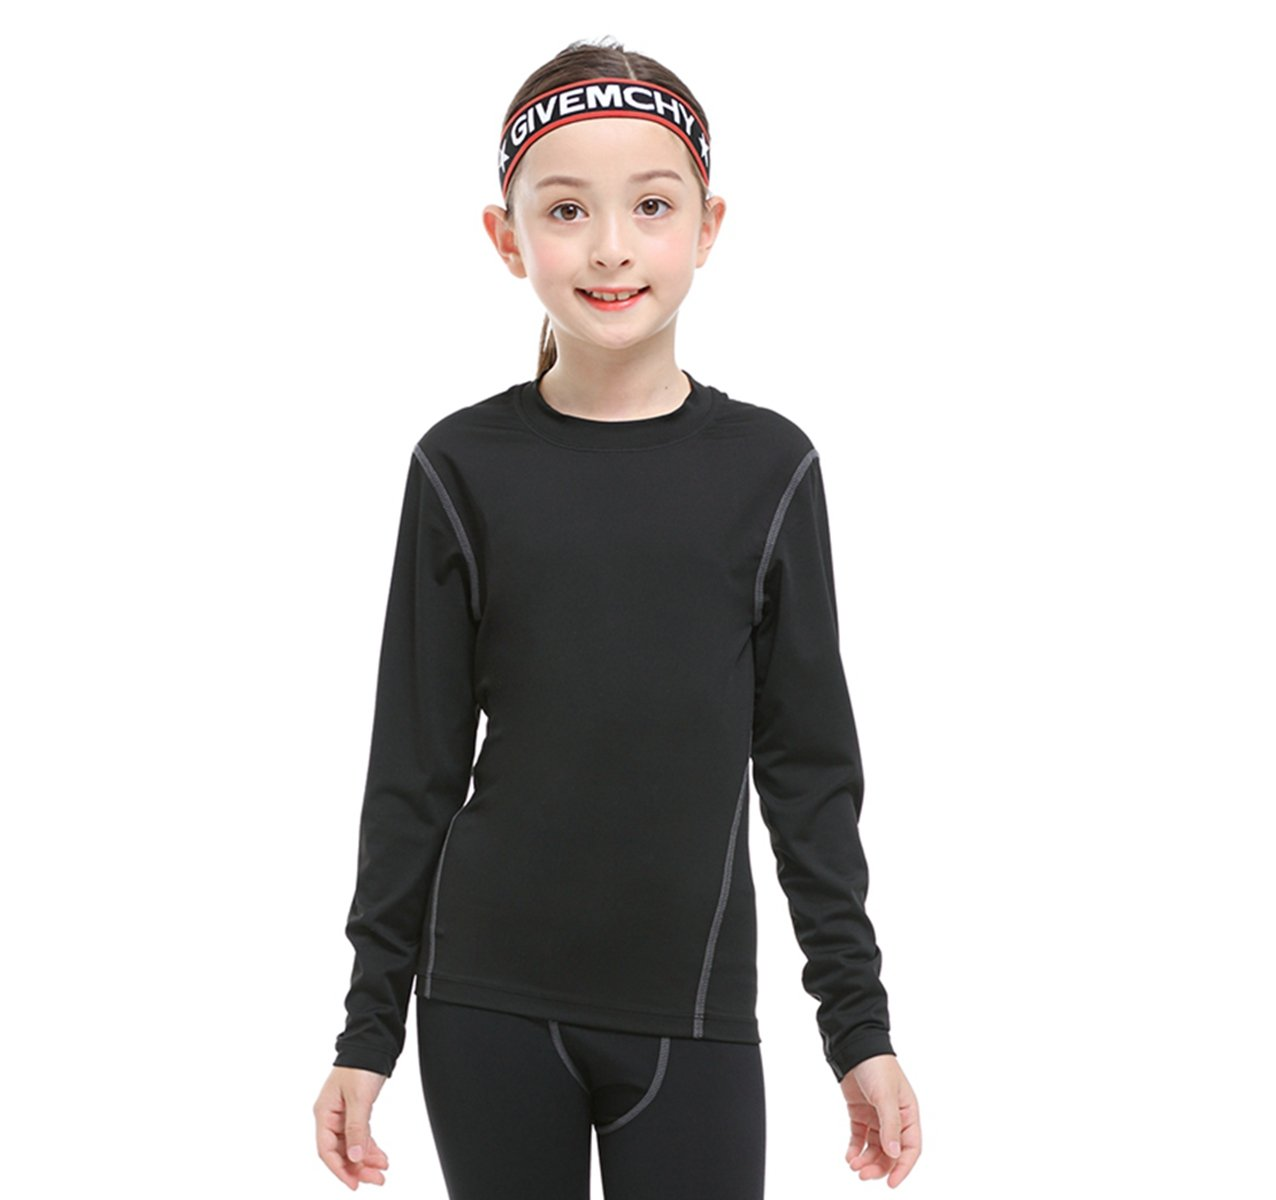 TOURME Girls Boys Compression Soccer T-Shirt Long Sleeve Kids Sun Shirts YEL-001-Tshirt